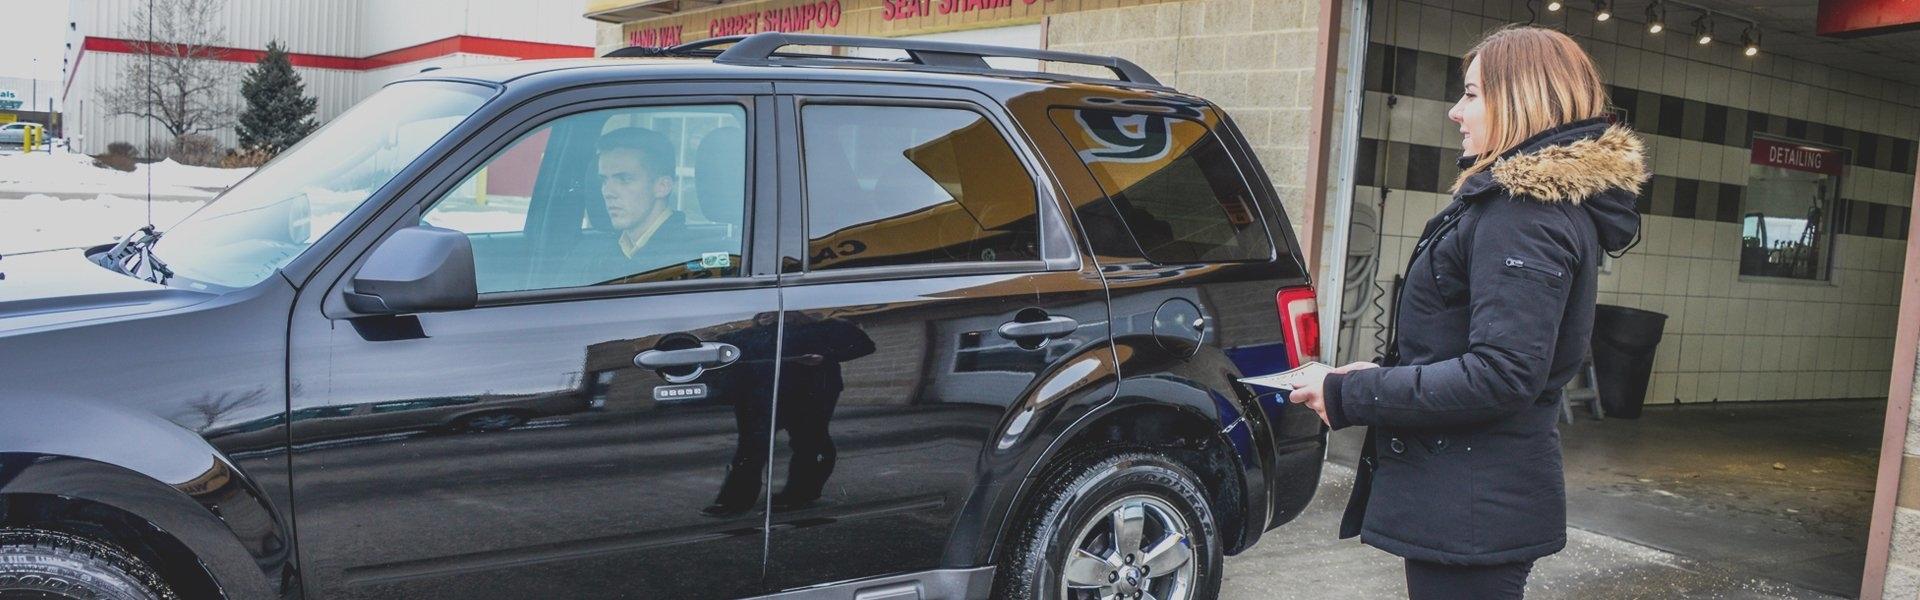 The Chamois Full Service Car Wash Winnipeg Mb